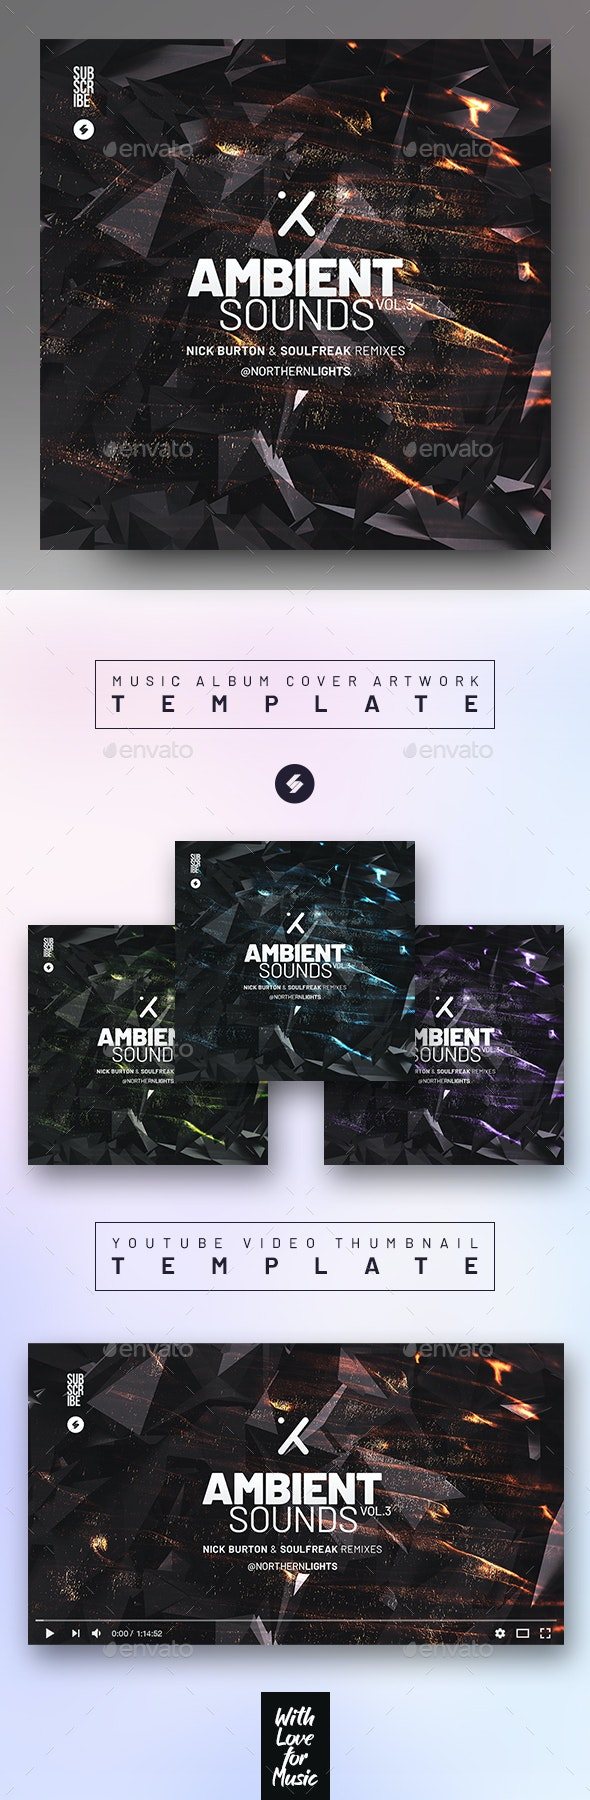 Ambient Sounds vol.3 – Album Cover Artwork / Youtube Thumbnail Template - Miscellaneous Social Media